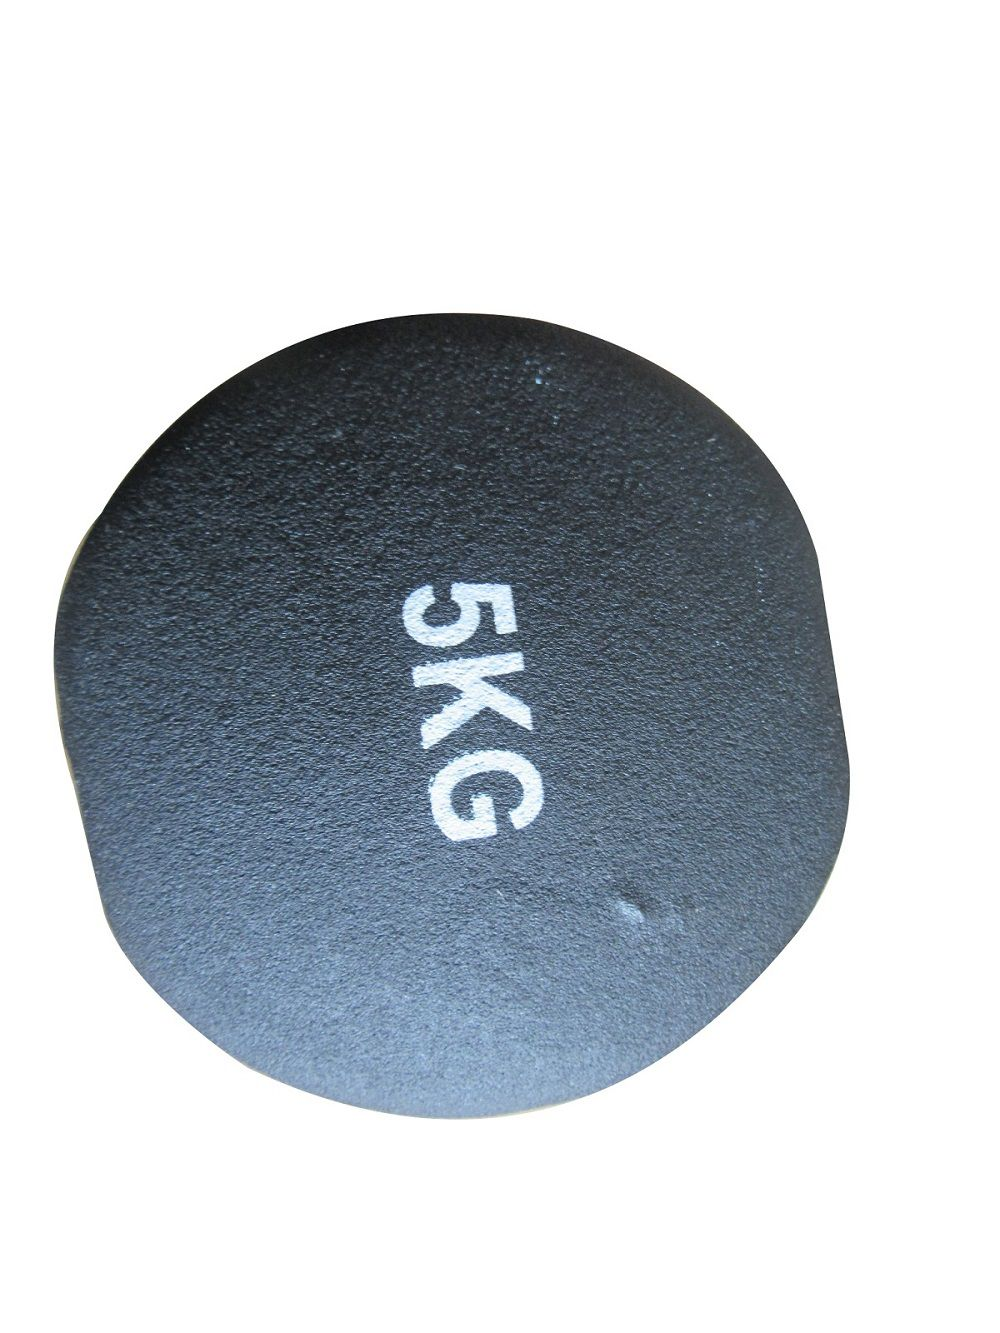 Haltere em Ferro Fundido Revestido com Neoprene Pelegrin  PEL-05DB 5kg - Preto